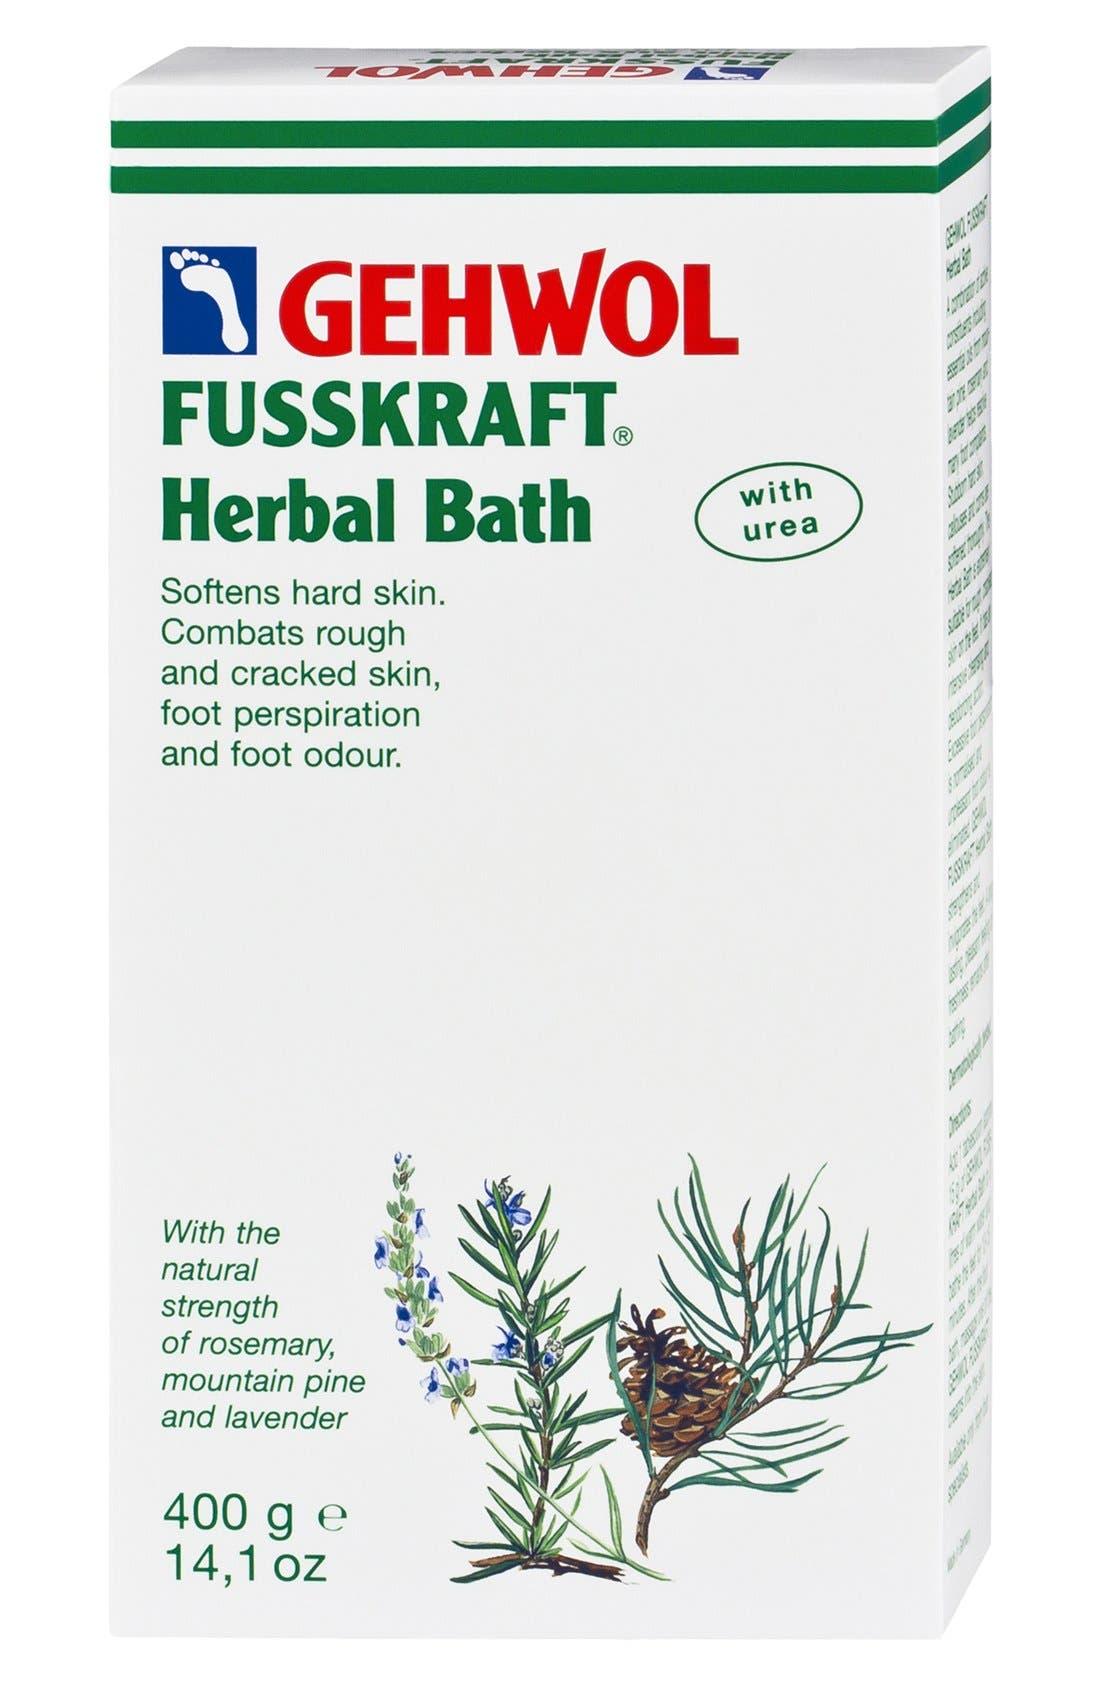 GEHWOL® FUSSKRAFT® Herbal Bath